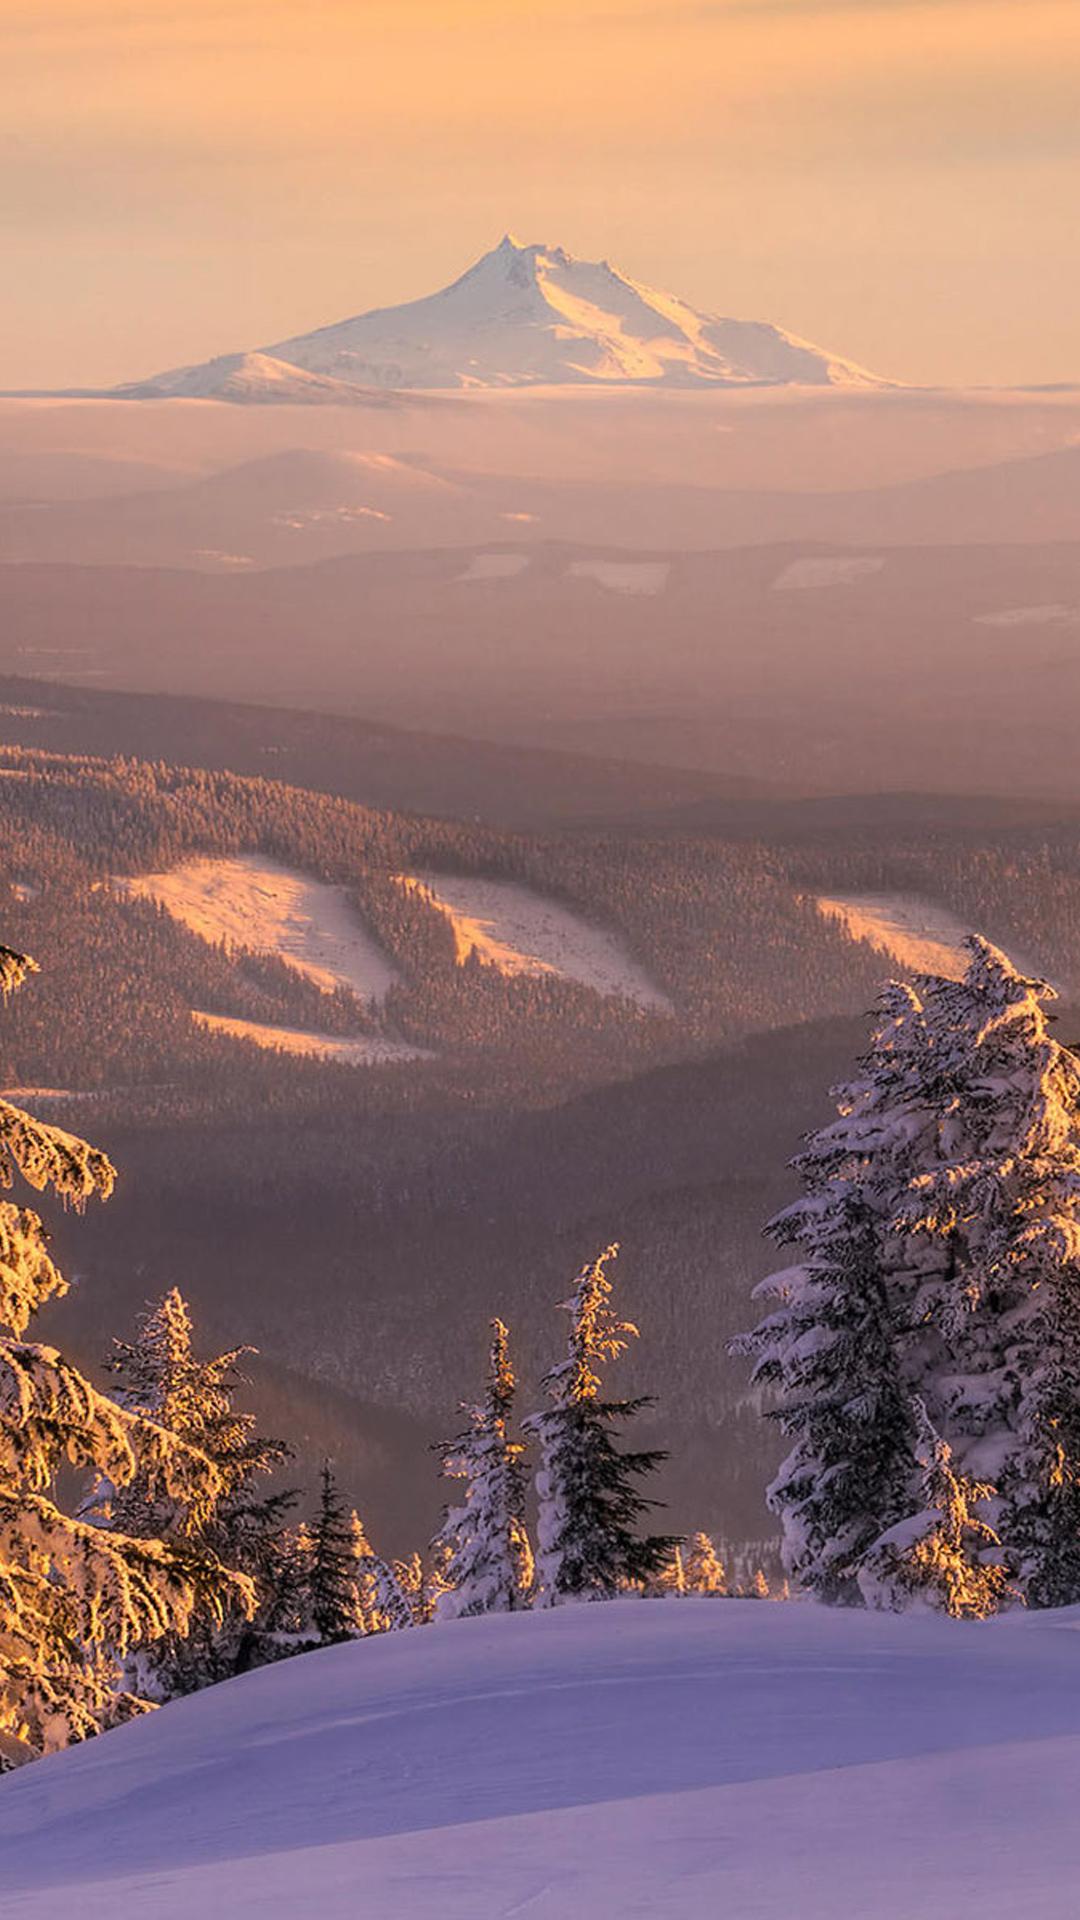 Fondo de pantalla con paisaje nevado